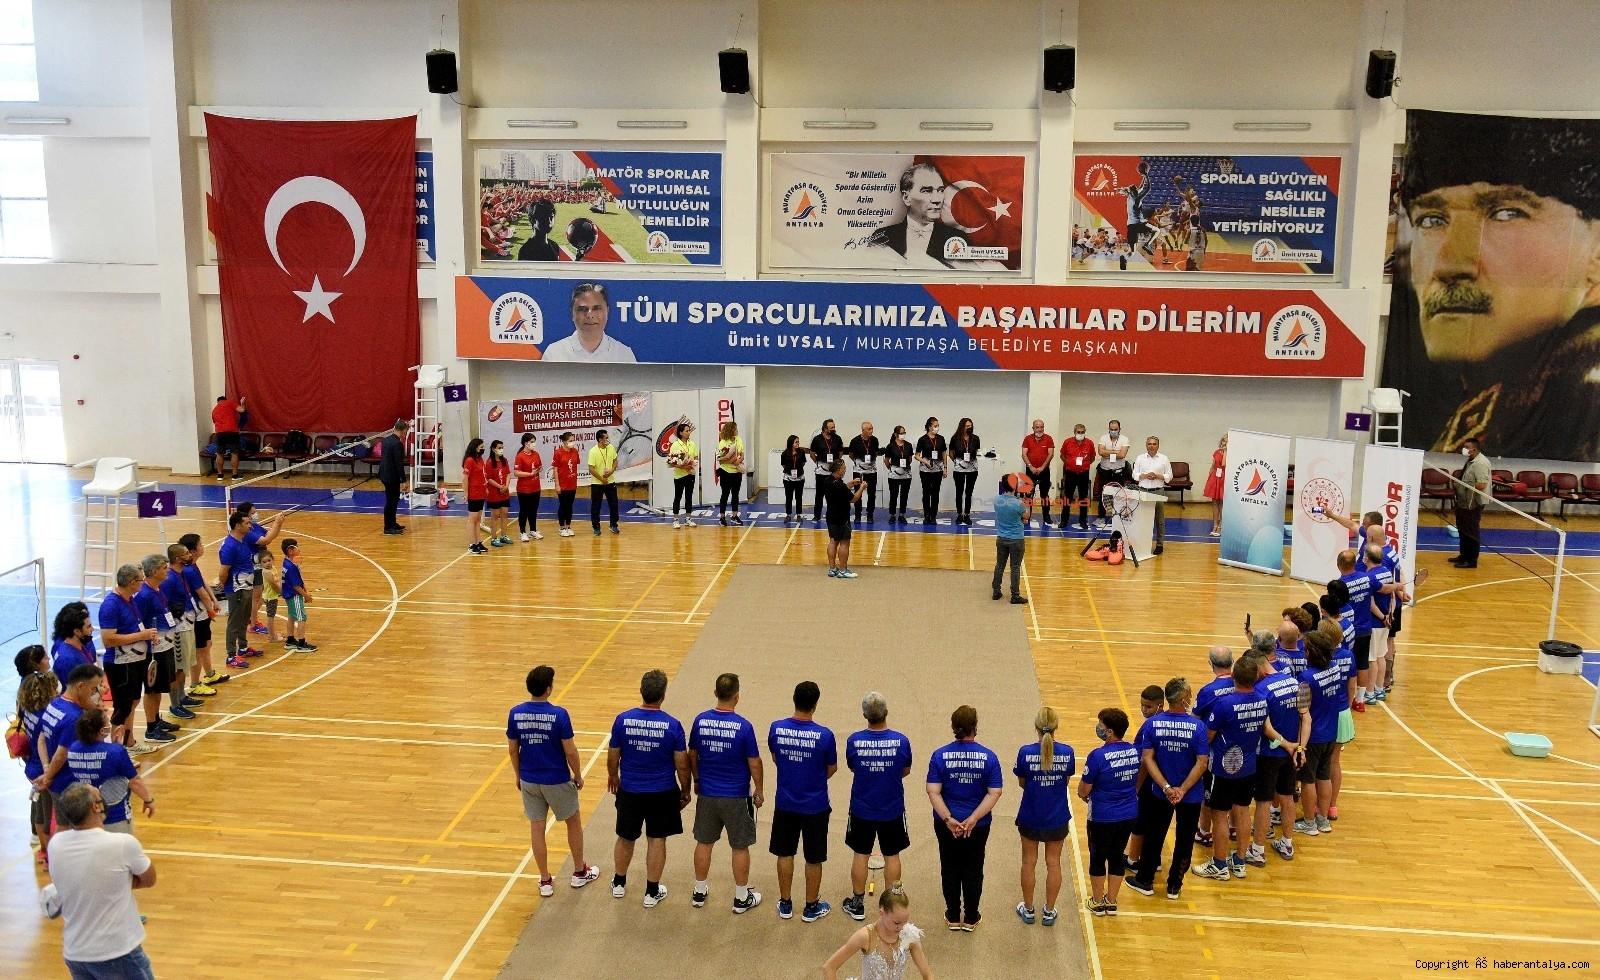 2021/06/badminton-senligi-acilis-vurusu-baskan-uysaldan-20210624AW35-3.jpg